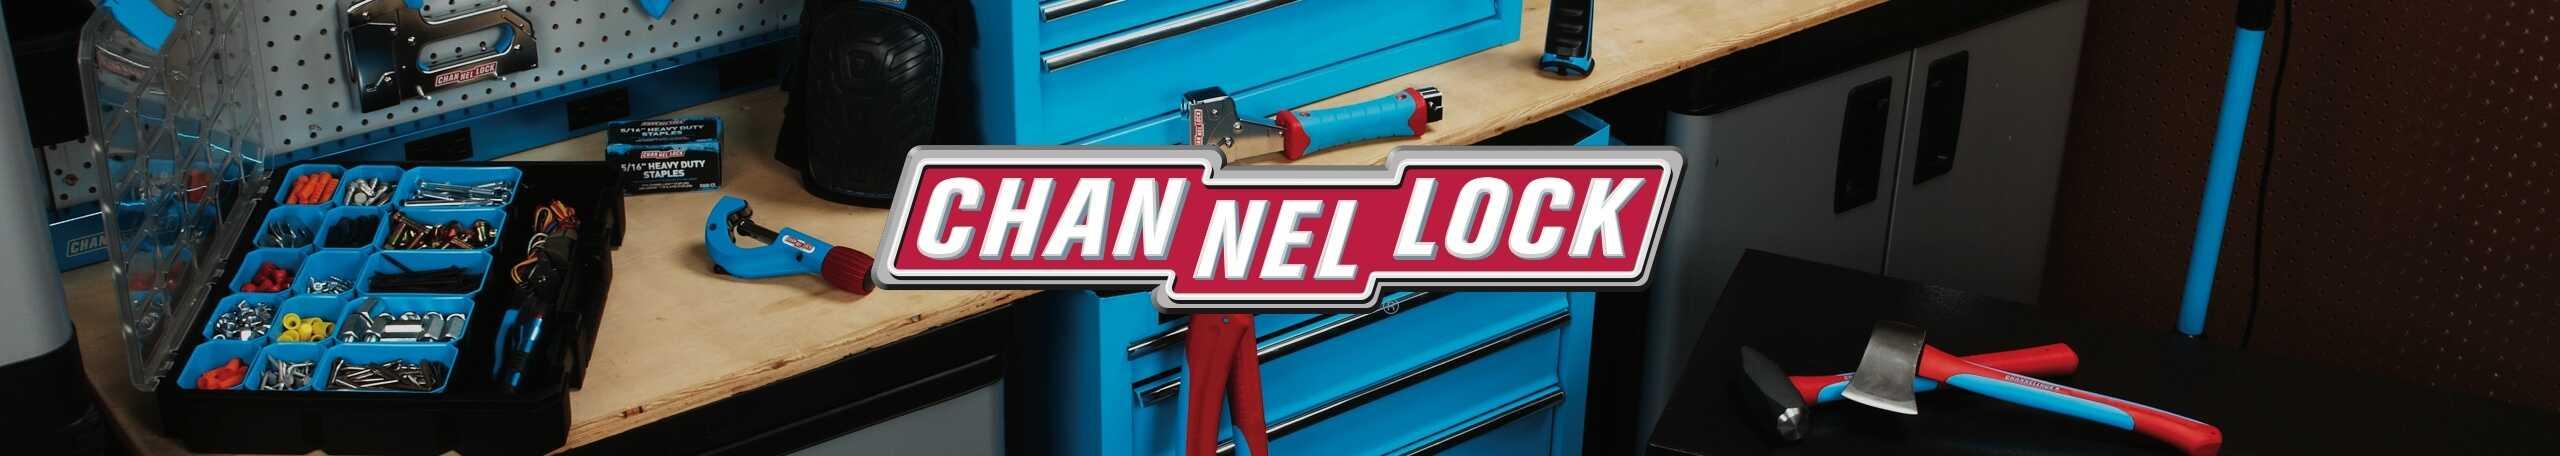 Shop Channellock Tools at Seward Lumber